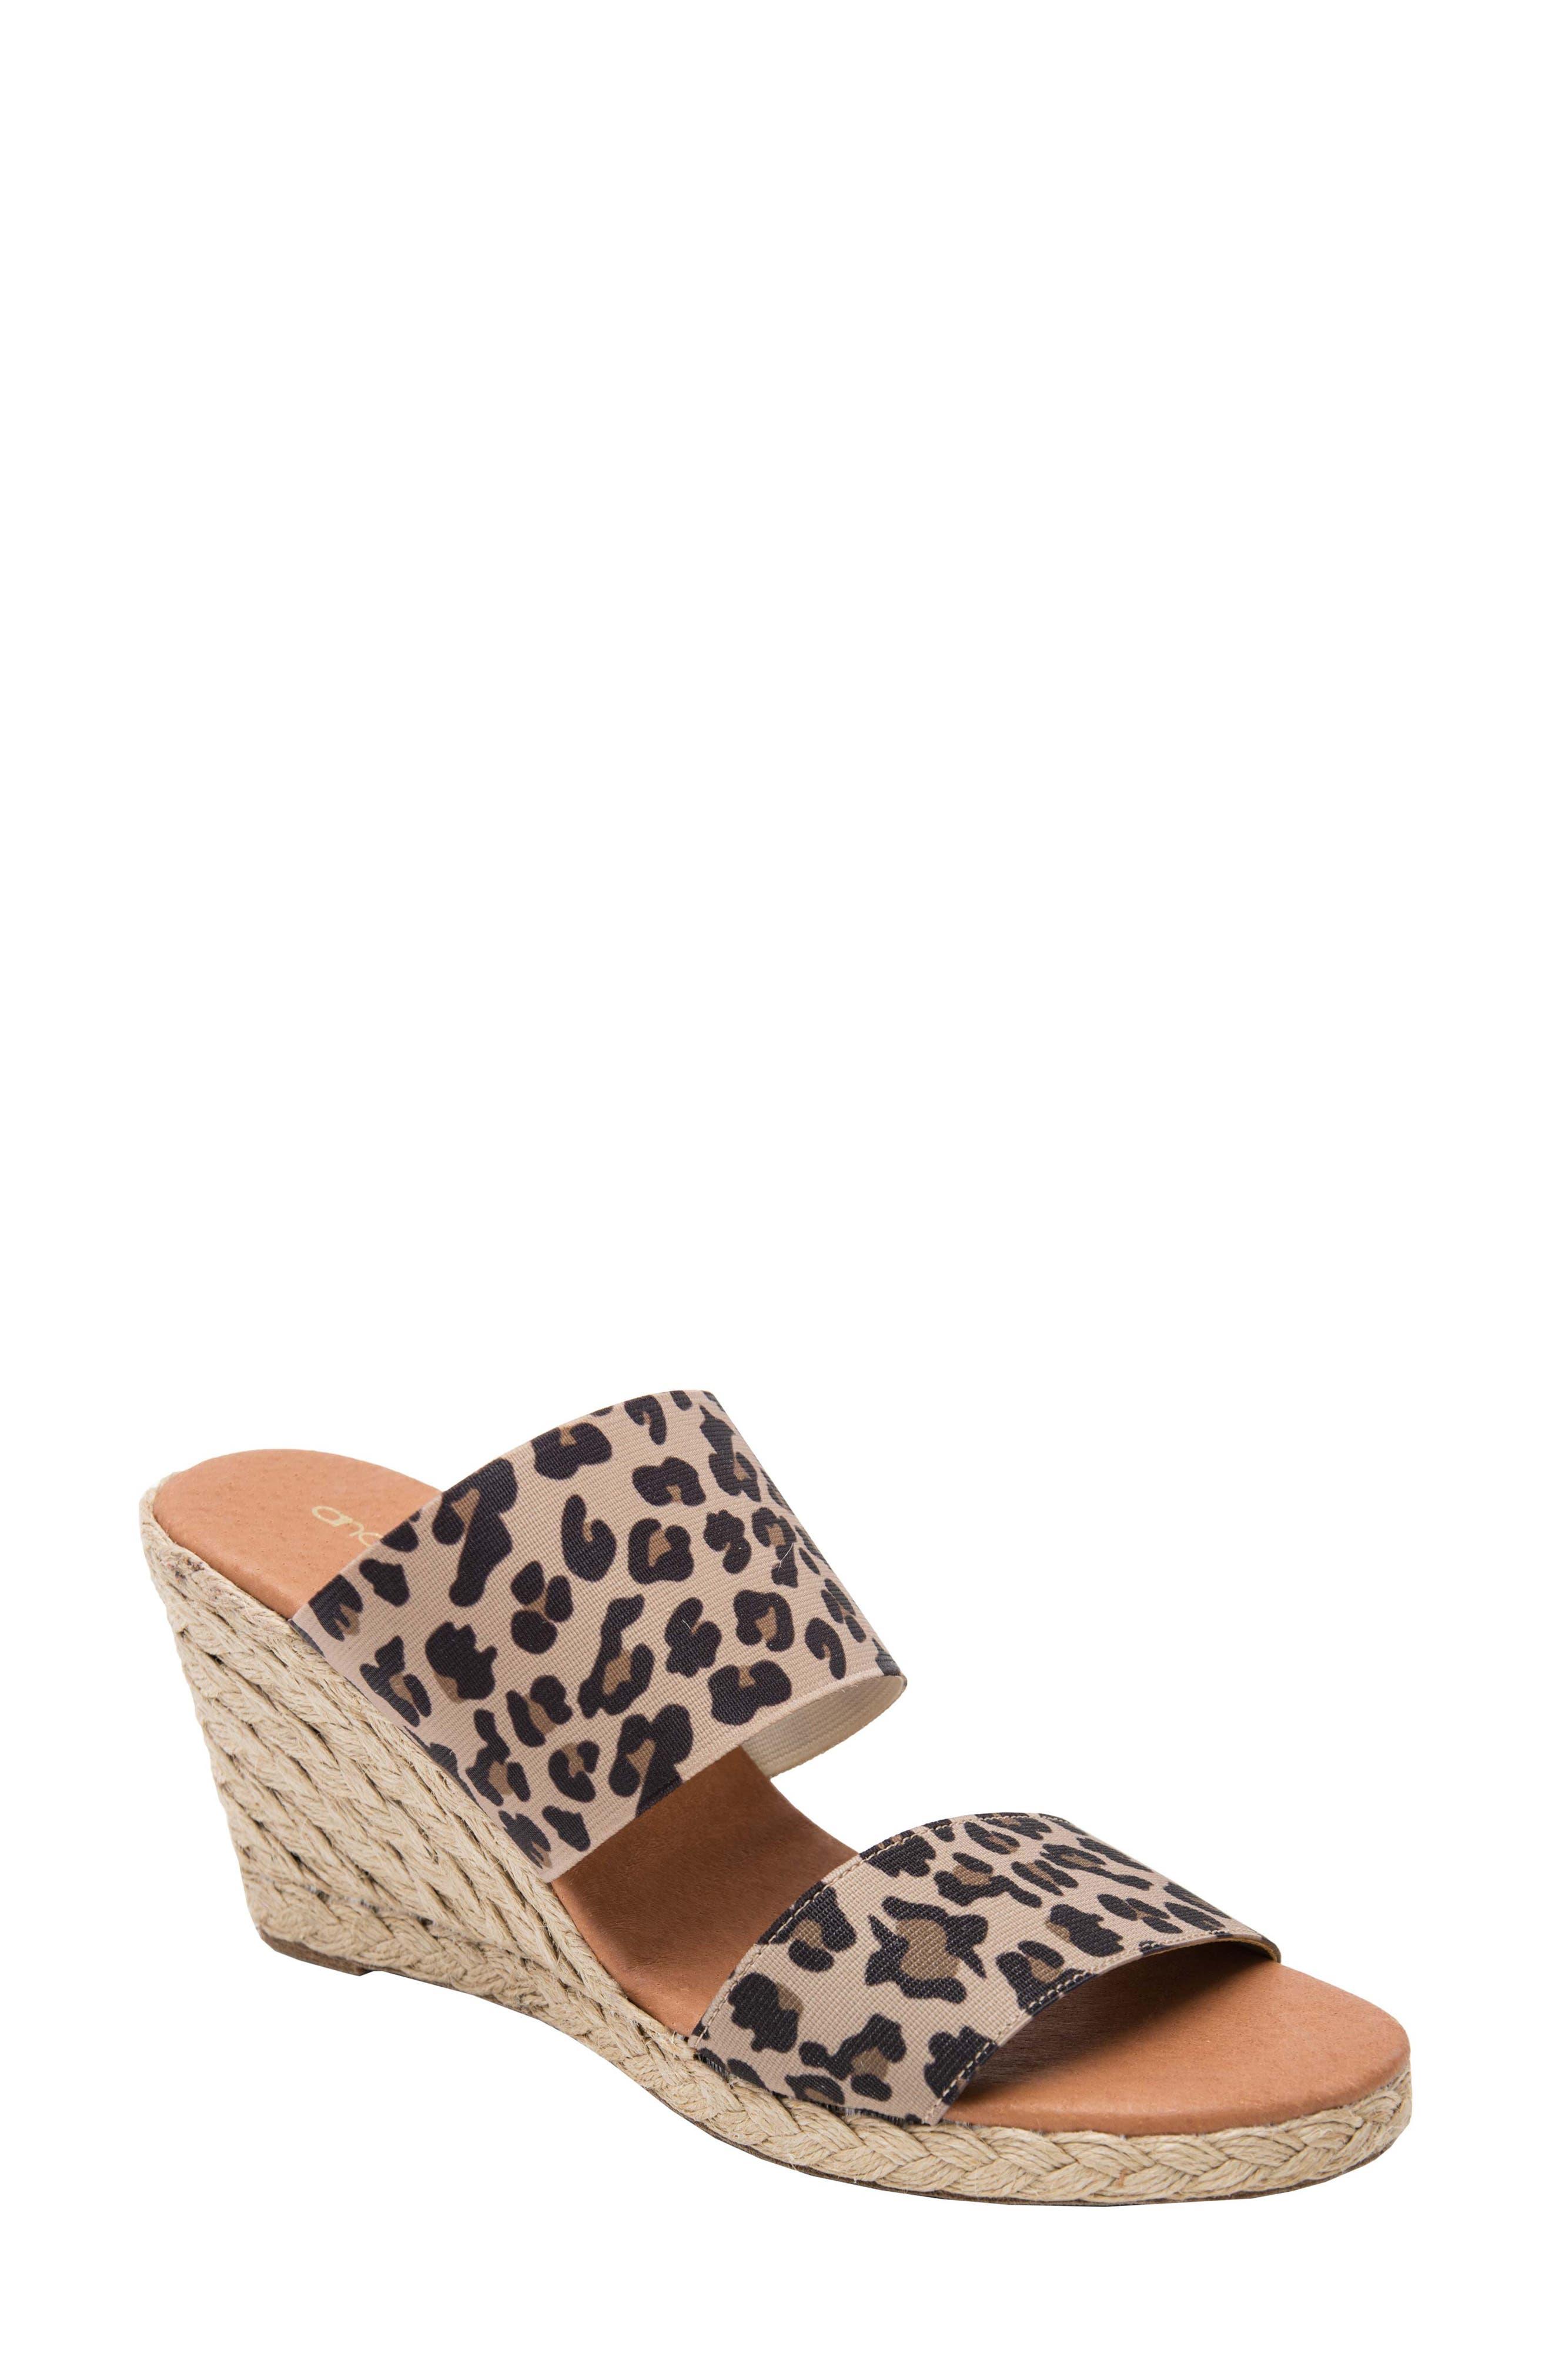 Amalia Strappy Espadrille Wedge Slide Sandal